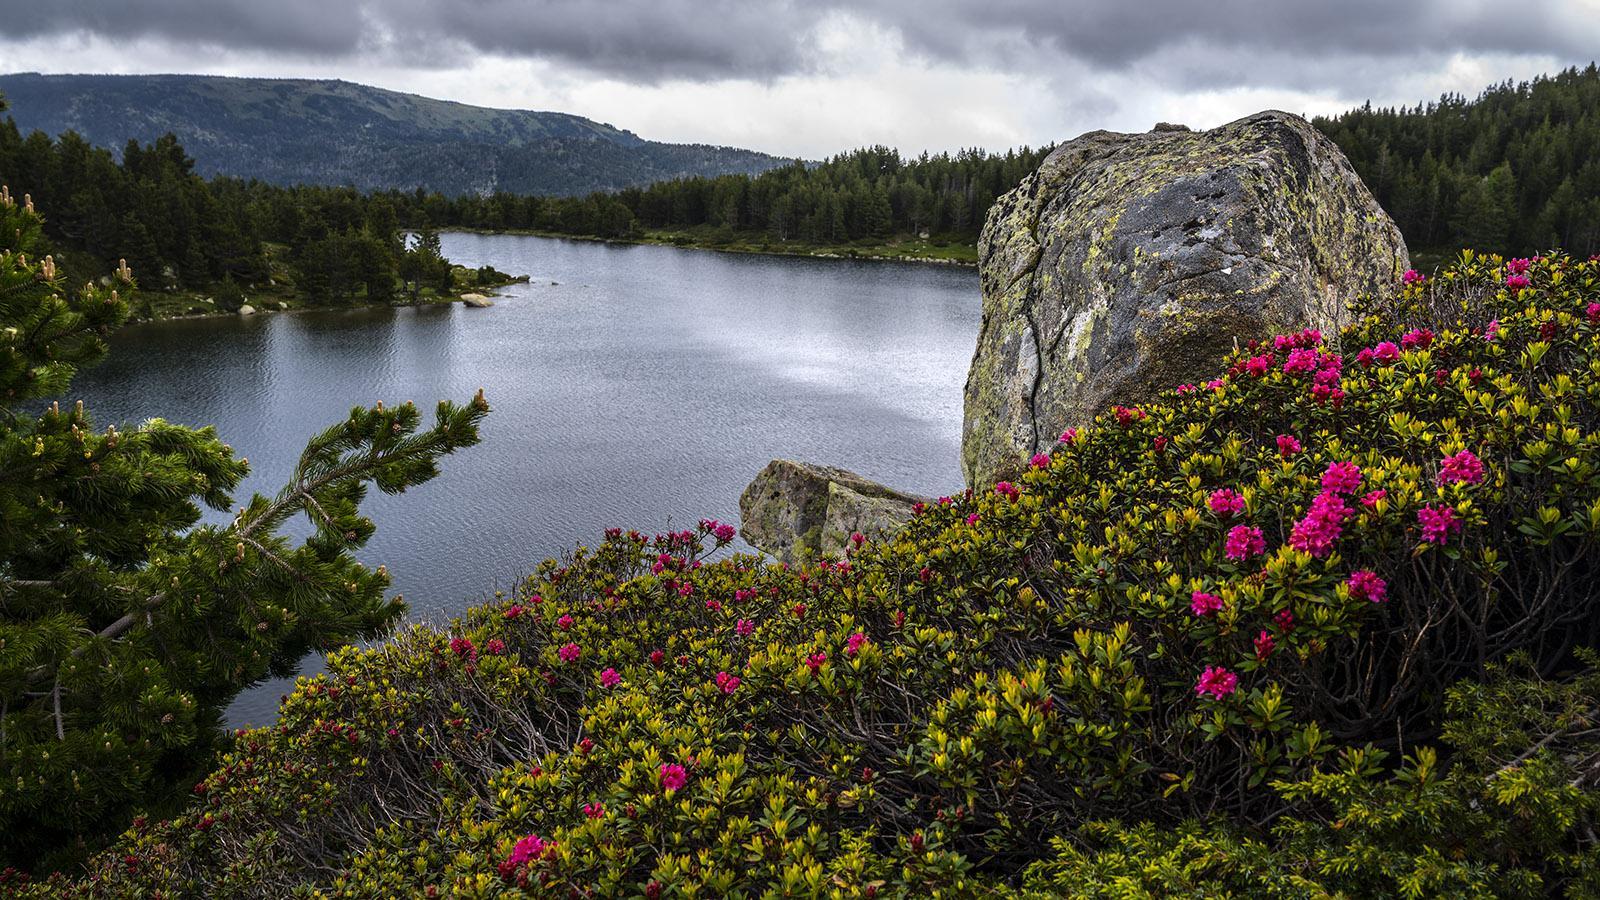 Der Lac Sac am Carlit-Massiv. Foto: Hilke Maunder